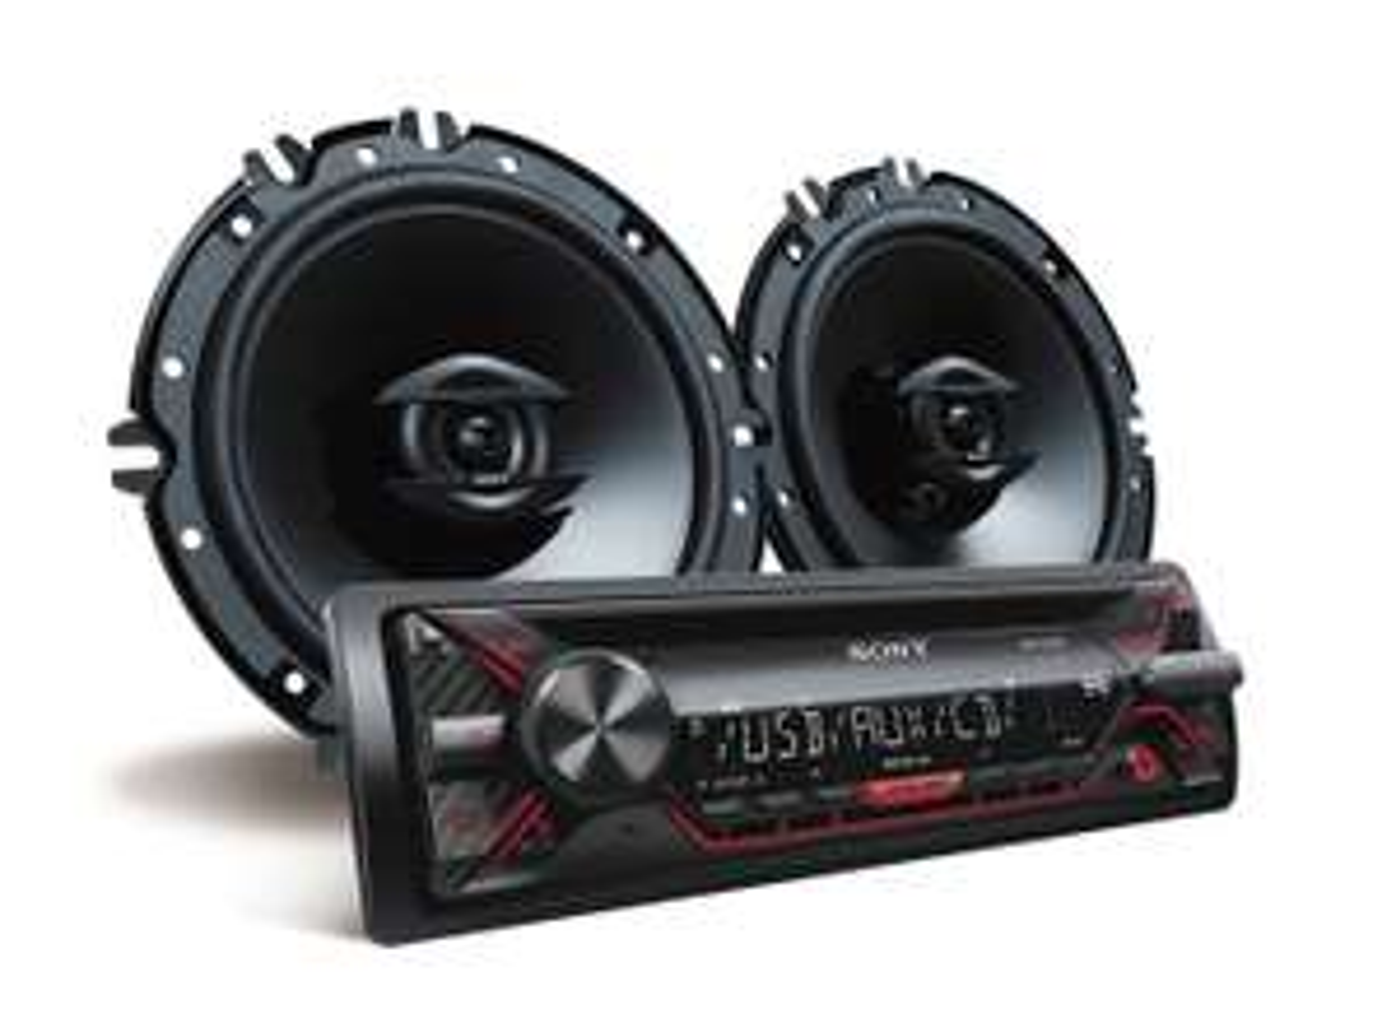 Best Buy: Sony - Autoestéreo con CD y USB CXSG1216U - Negro